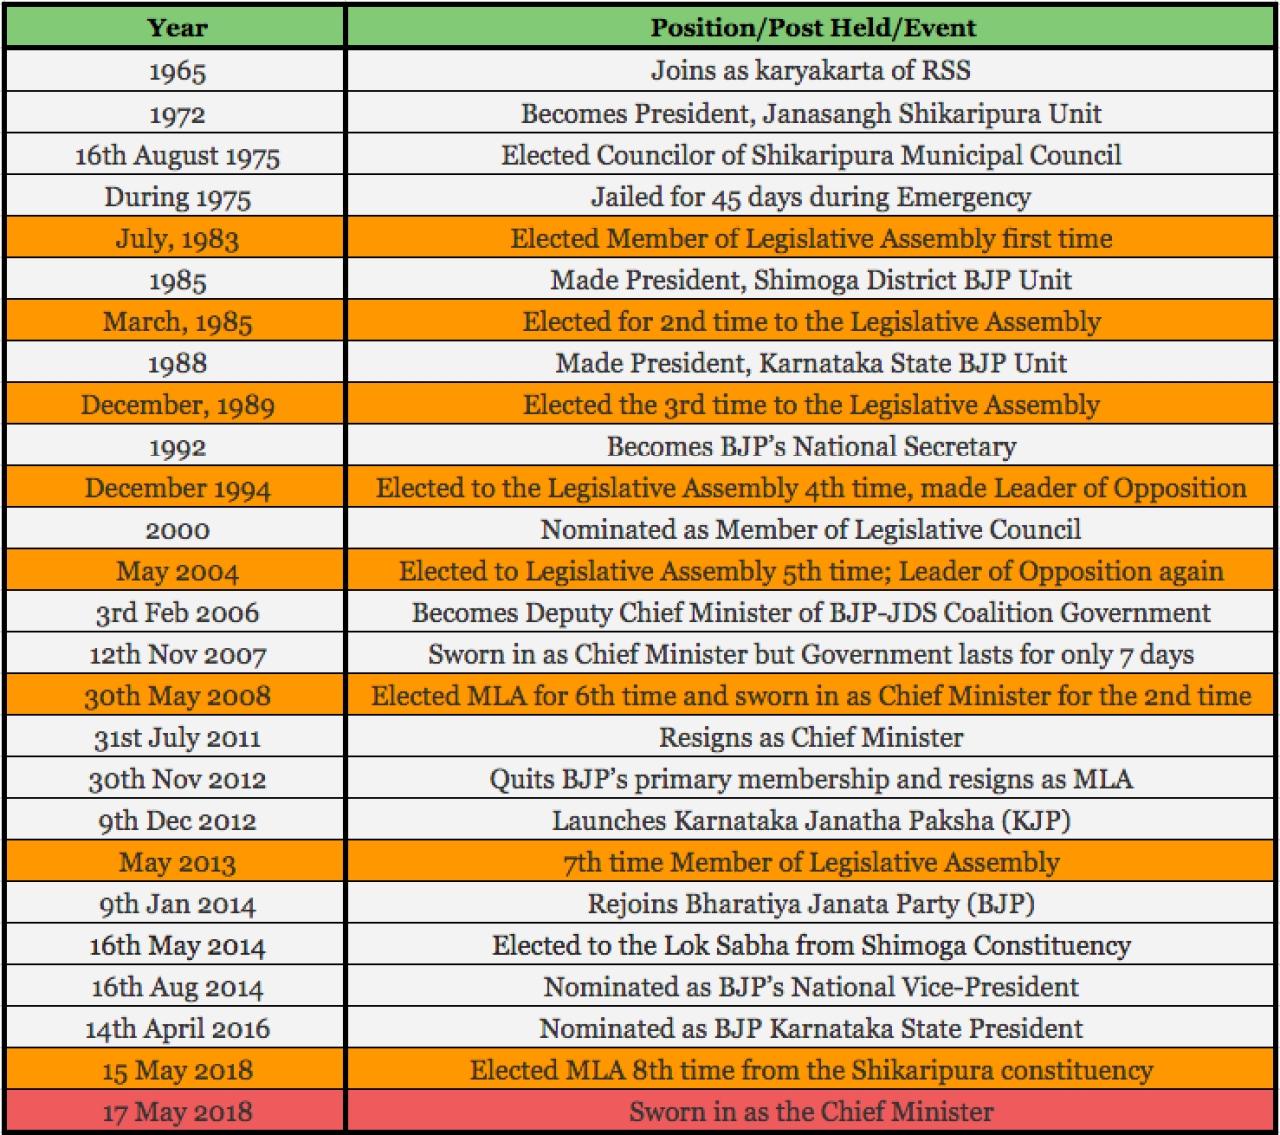 B S Yeddyurappa's timeline